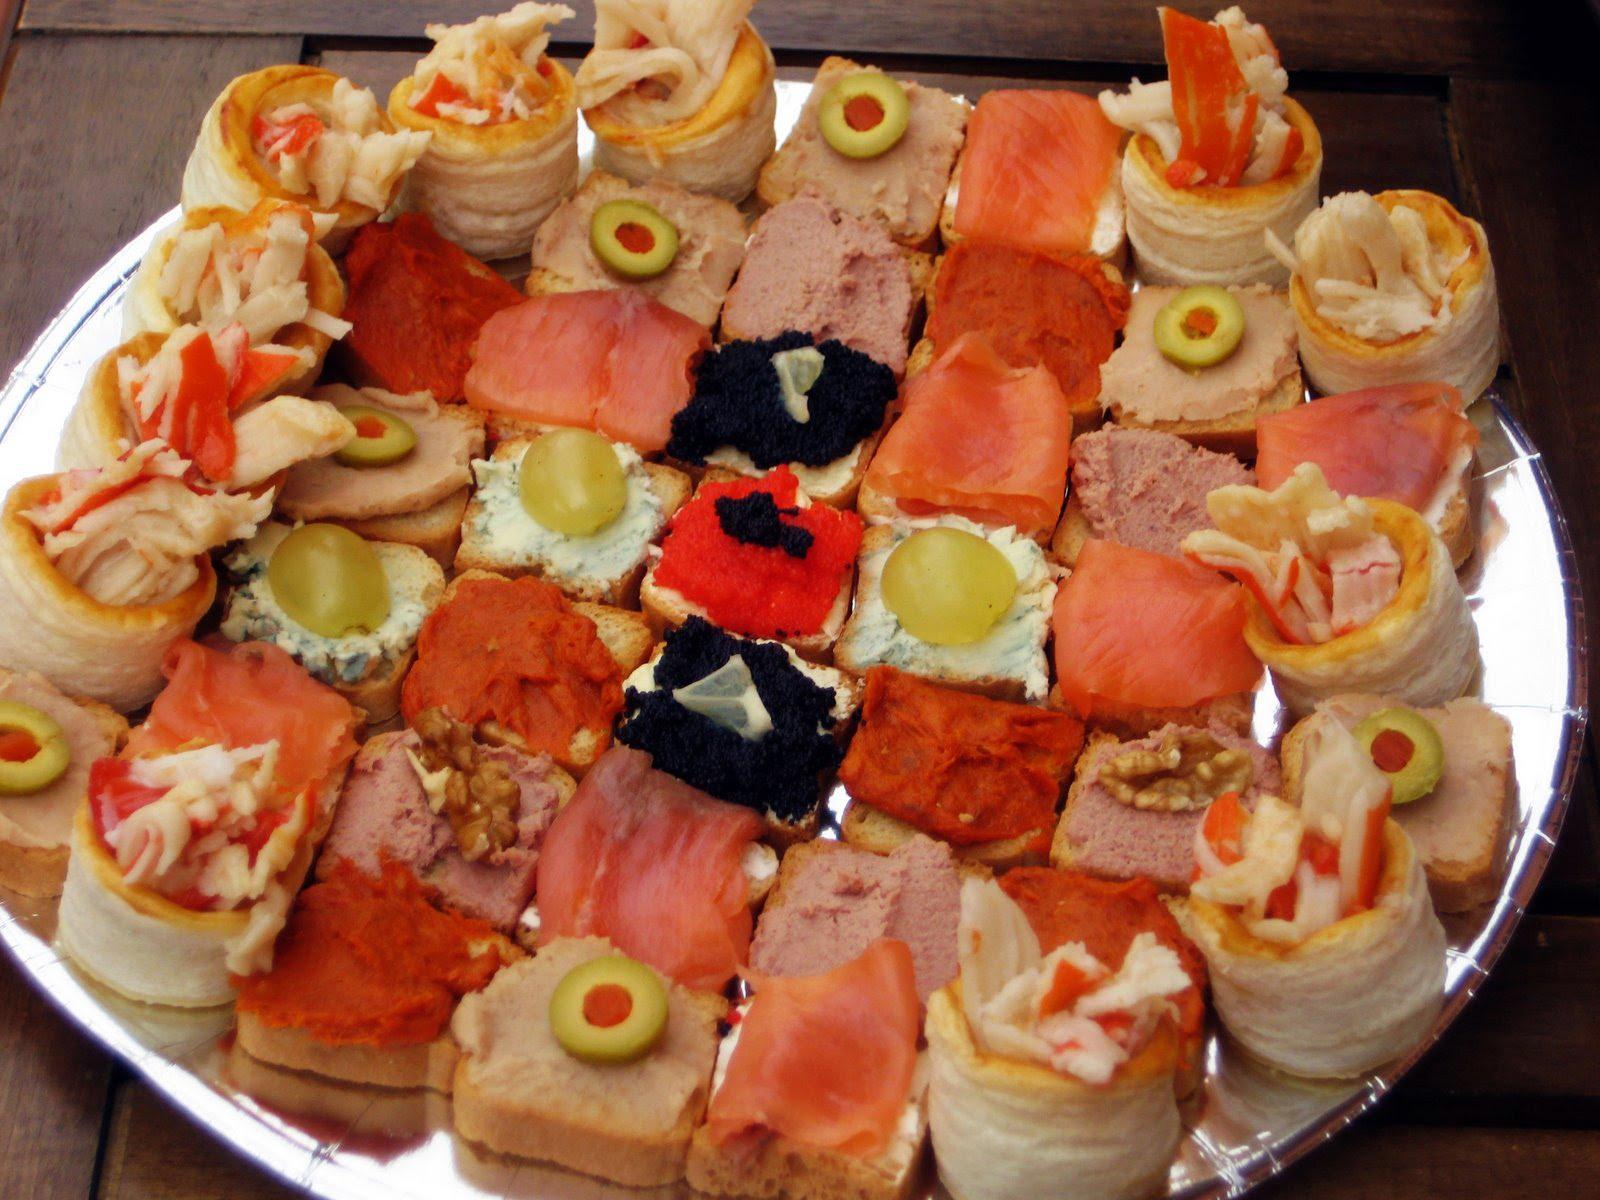 Menjar i gaudir canap s variats canapes variados for Canapes sencillos y rapidos